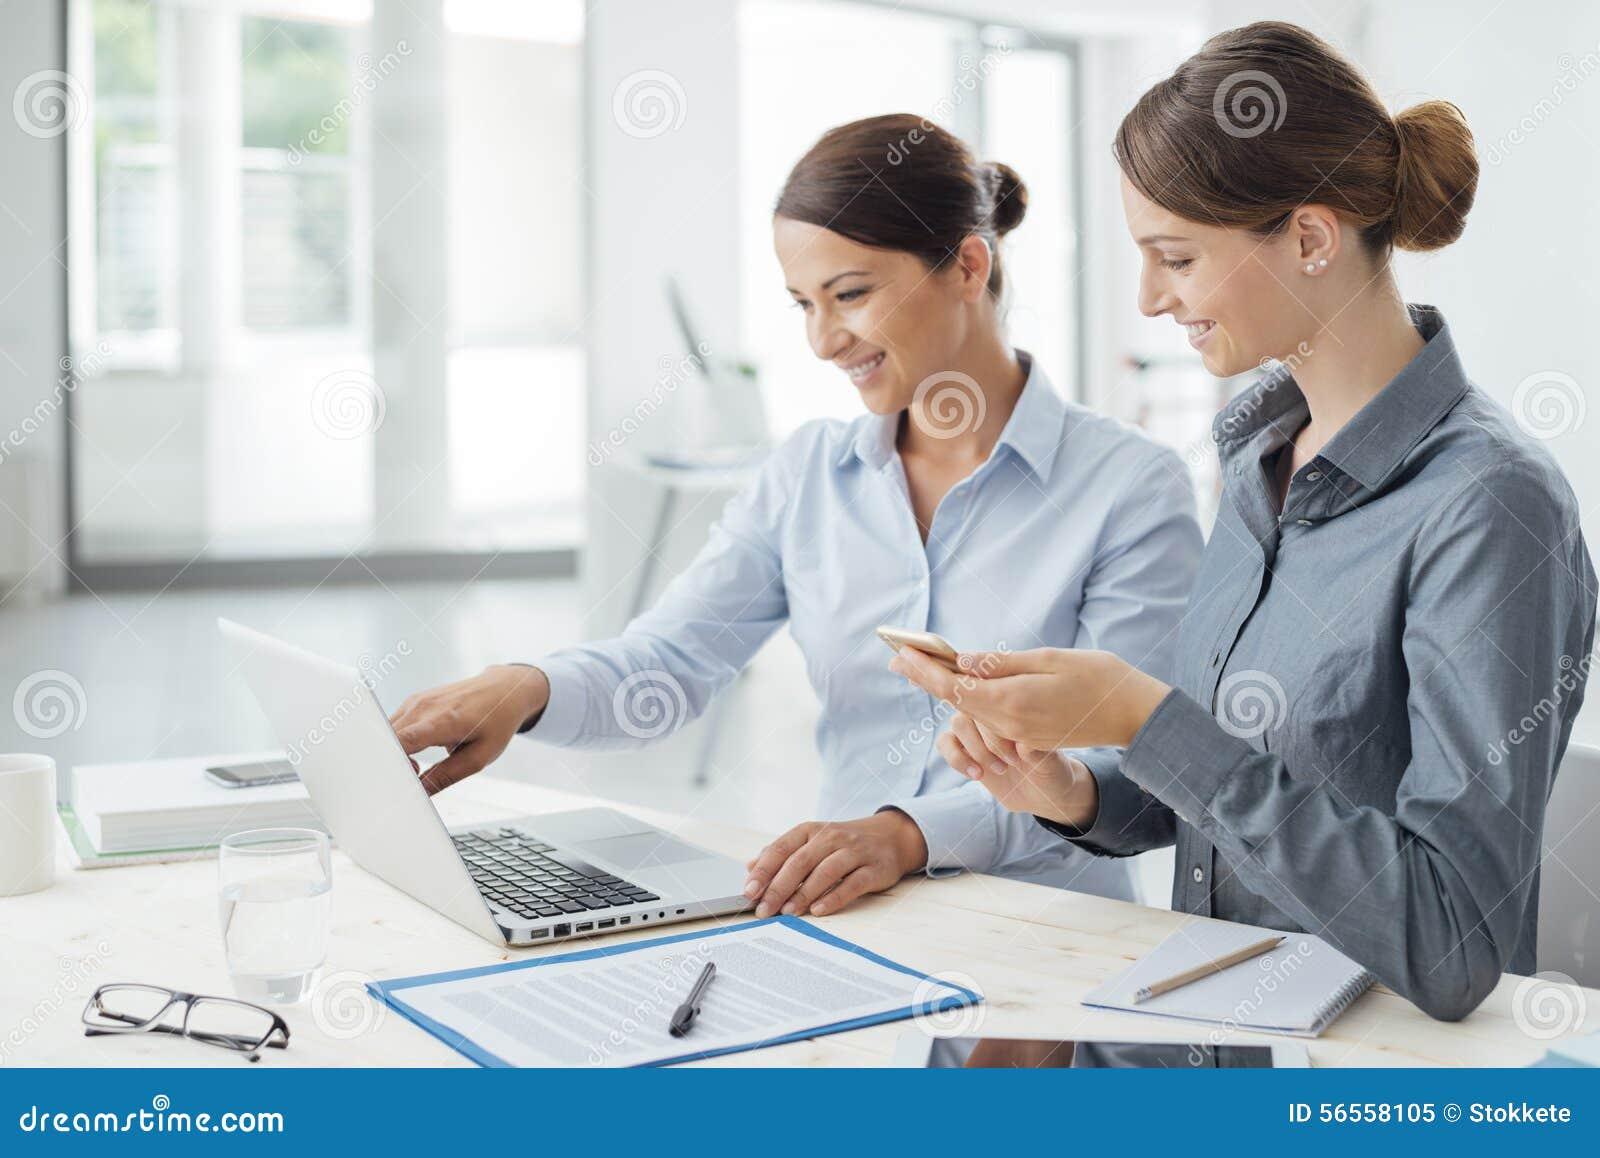 Download Επιχειρησιακές γυναίκες που εργάζονται μαζί σε ένα Lap-top Στοκ Εικόνα - εικόνα από διαδίκτυο, πουκάμισο: 56558105